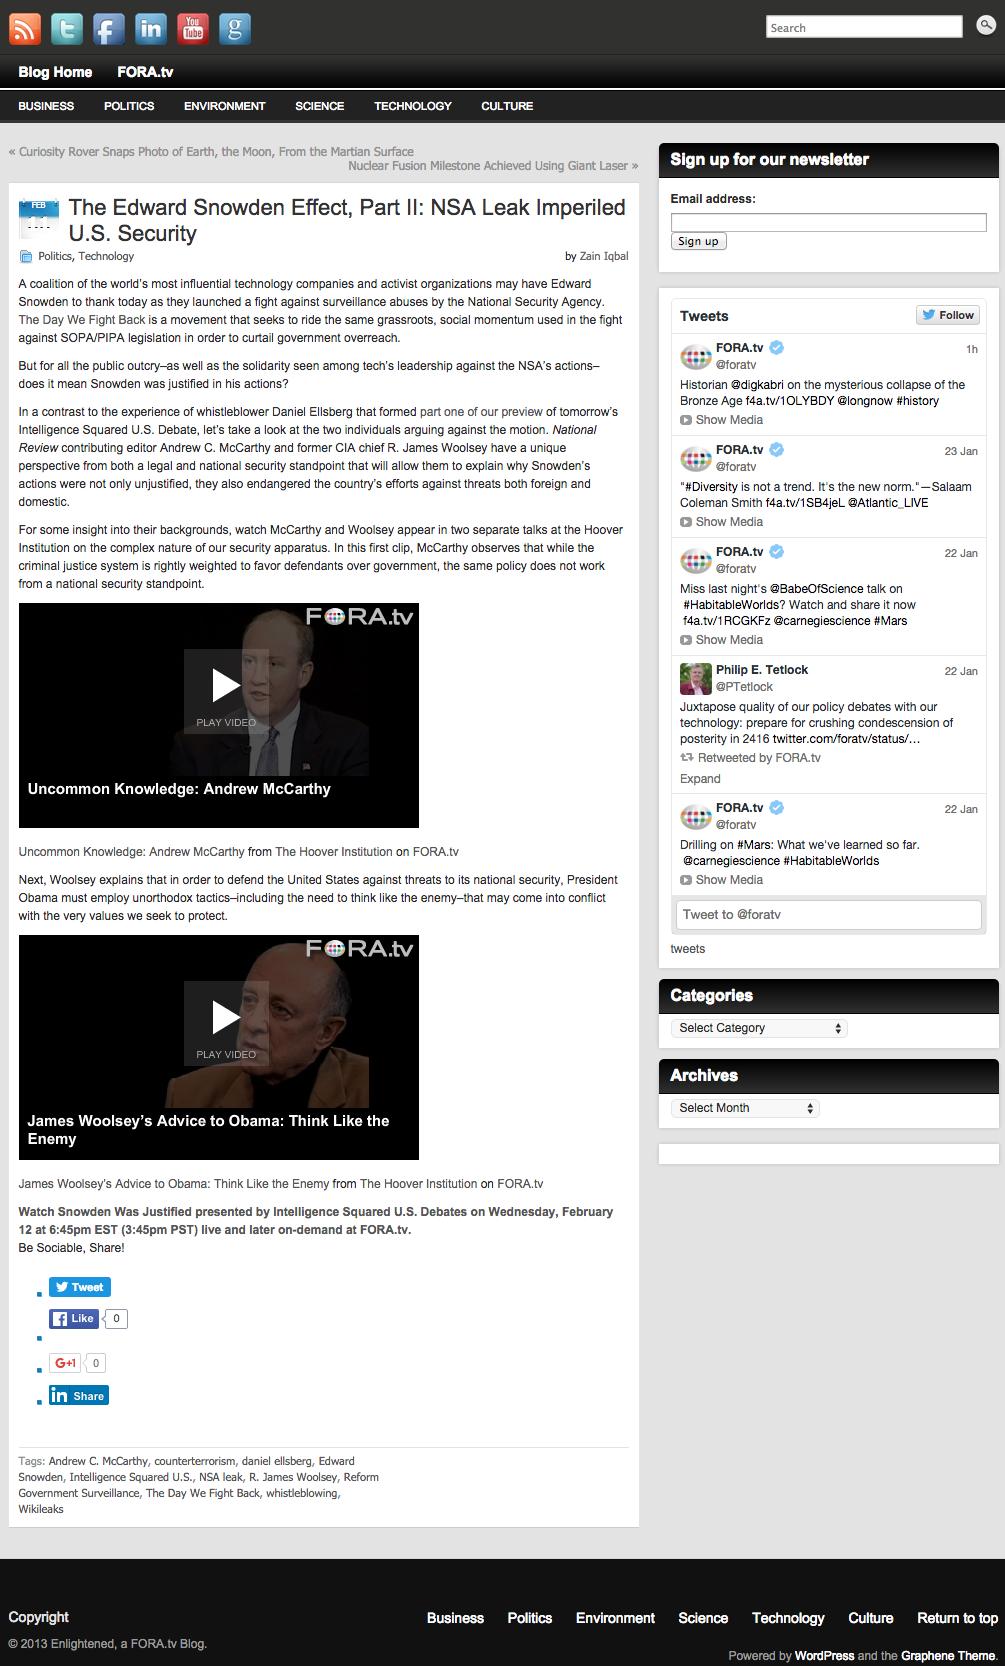 screencapture-enarchive-fora-tv-2014-02-edward-snowden-effect-nsa-leak-imperiled-u-s-security.png